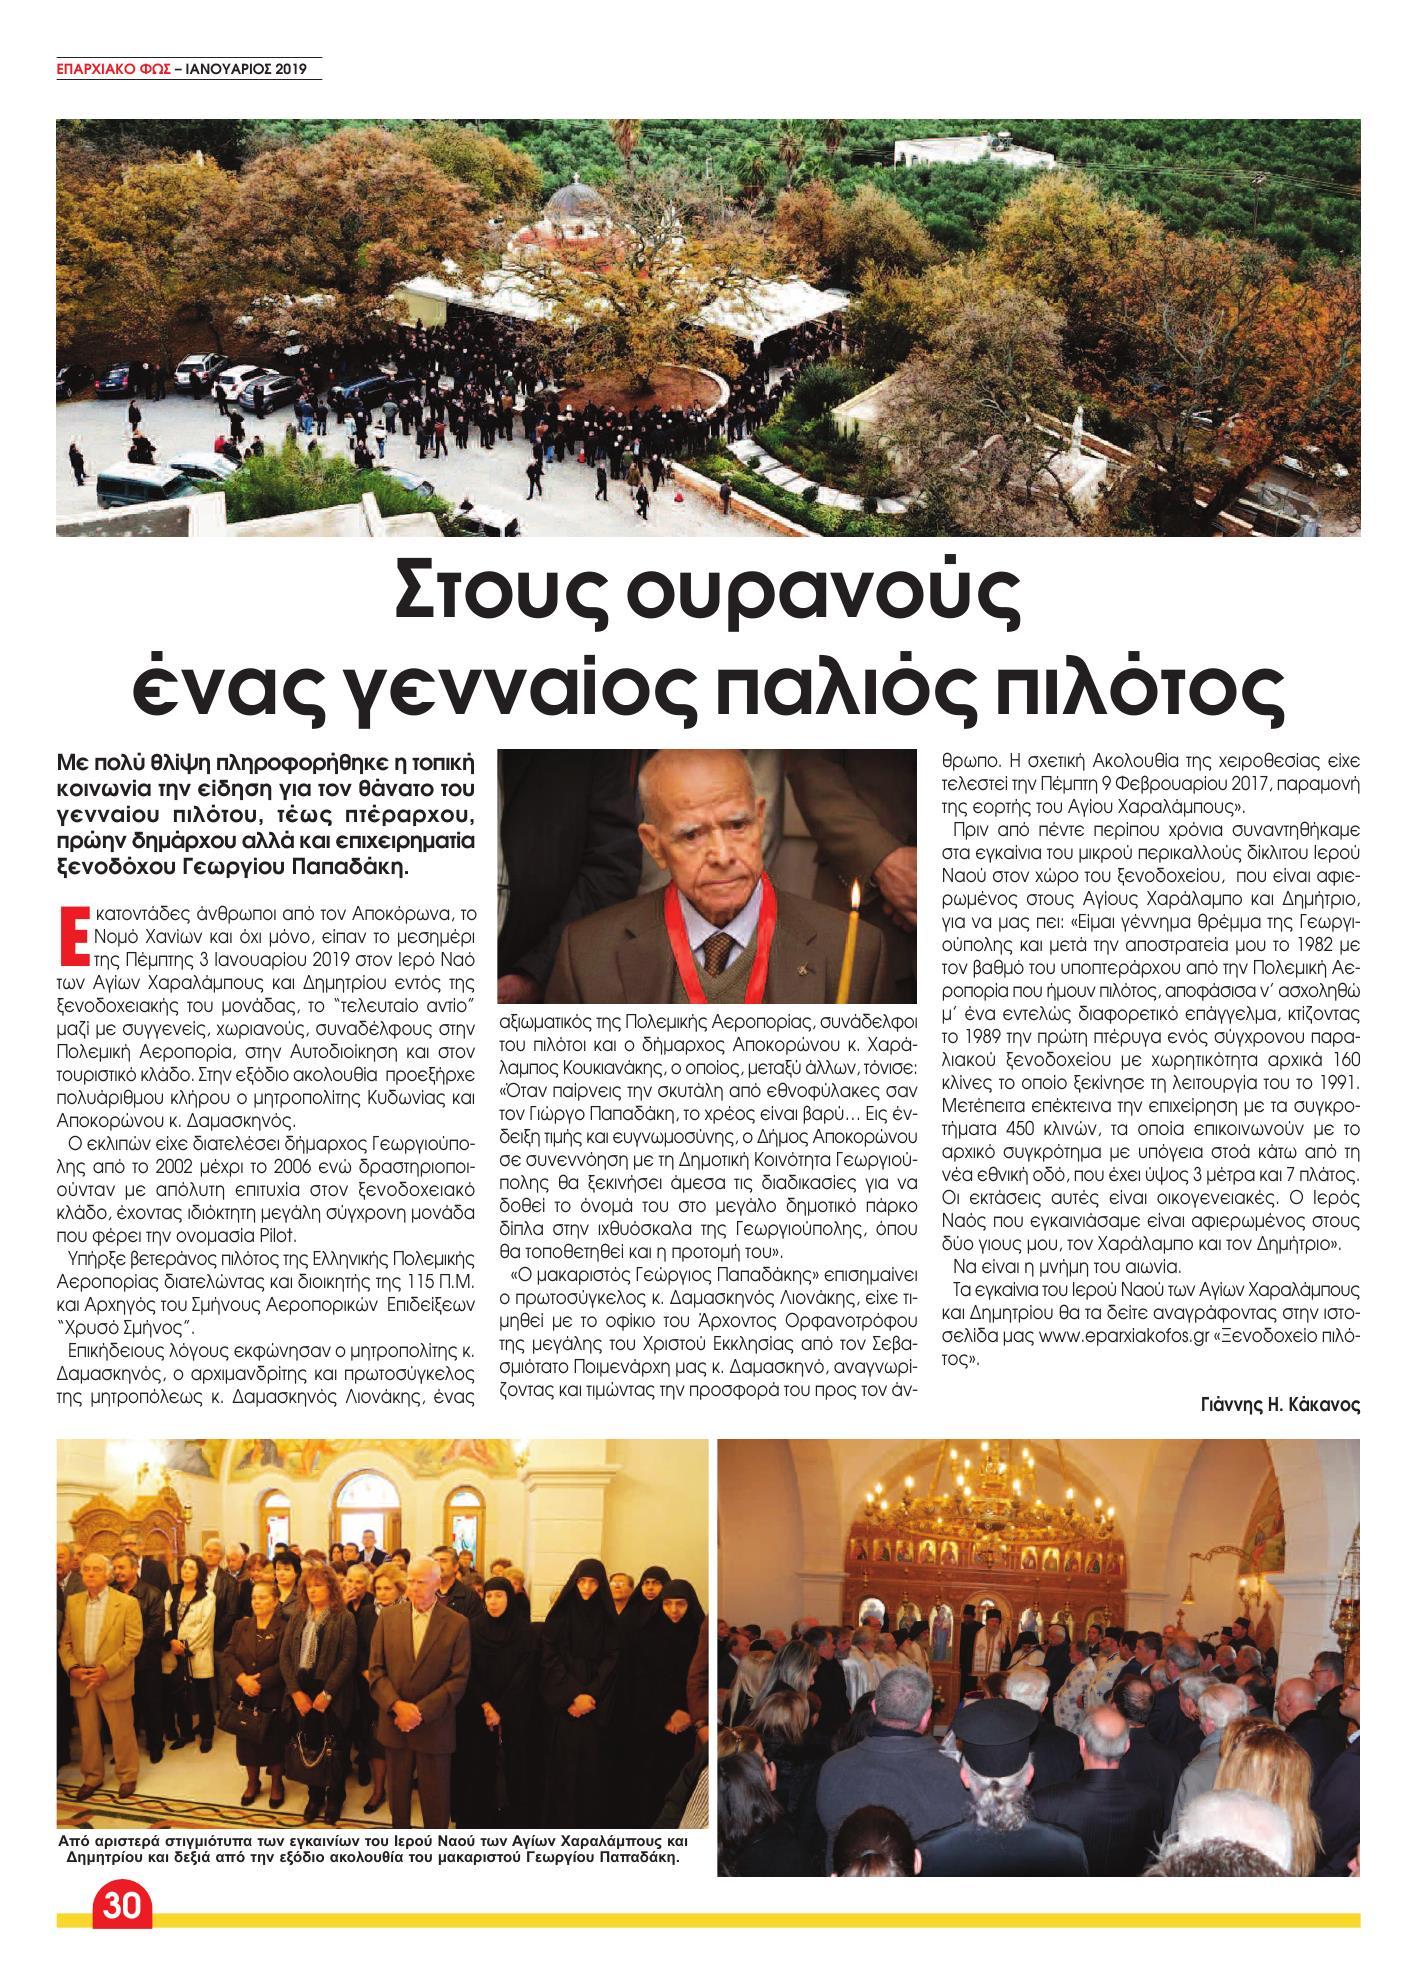 23 KAKANOULHS (Page 30)